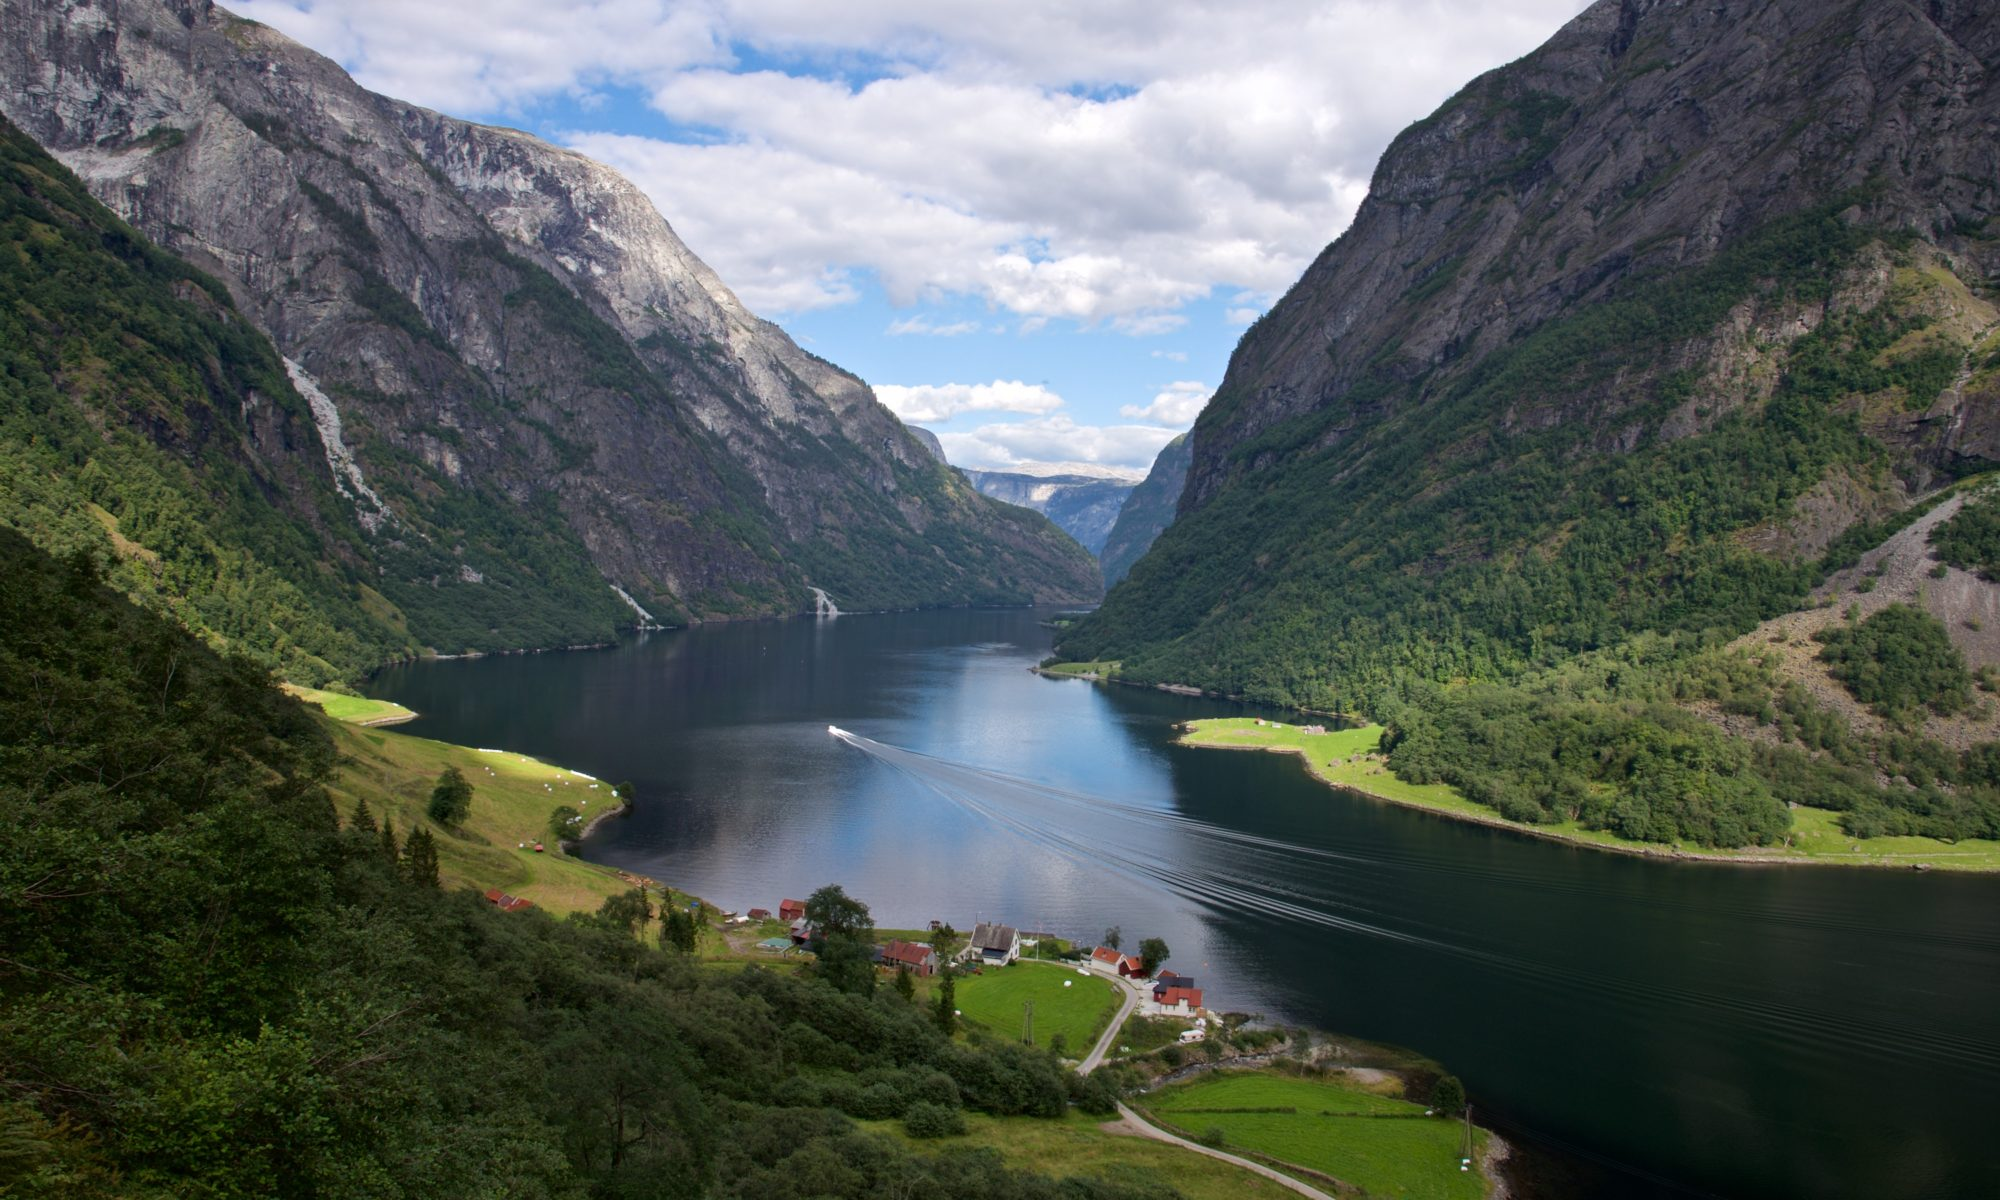 Hike to Rimstigen by the UNESCO Protected Nærøyfjord